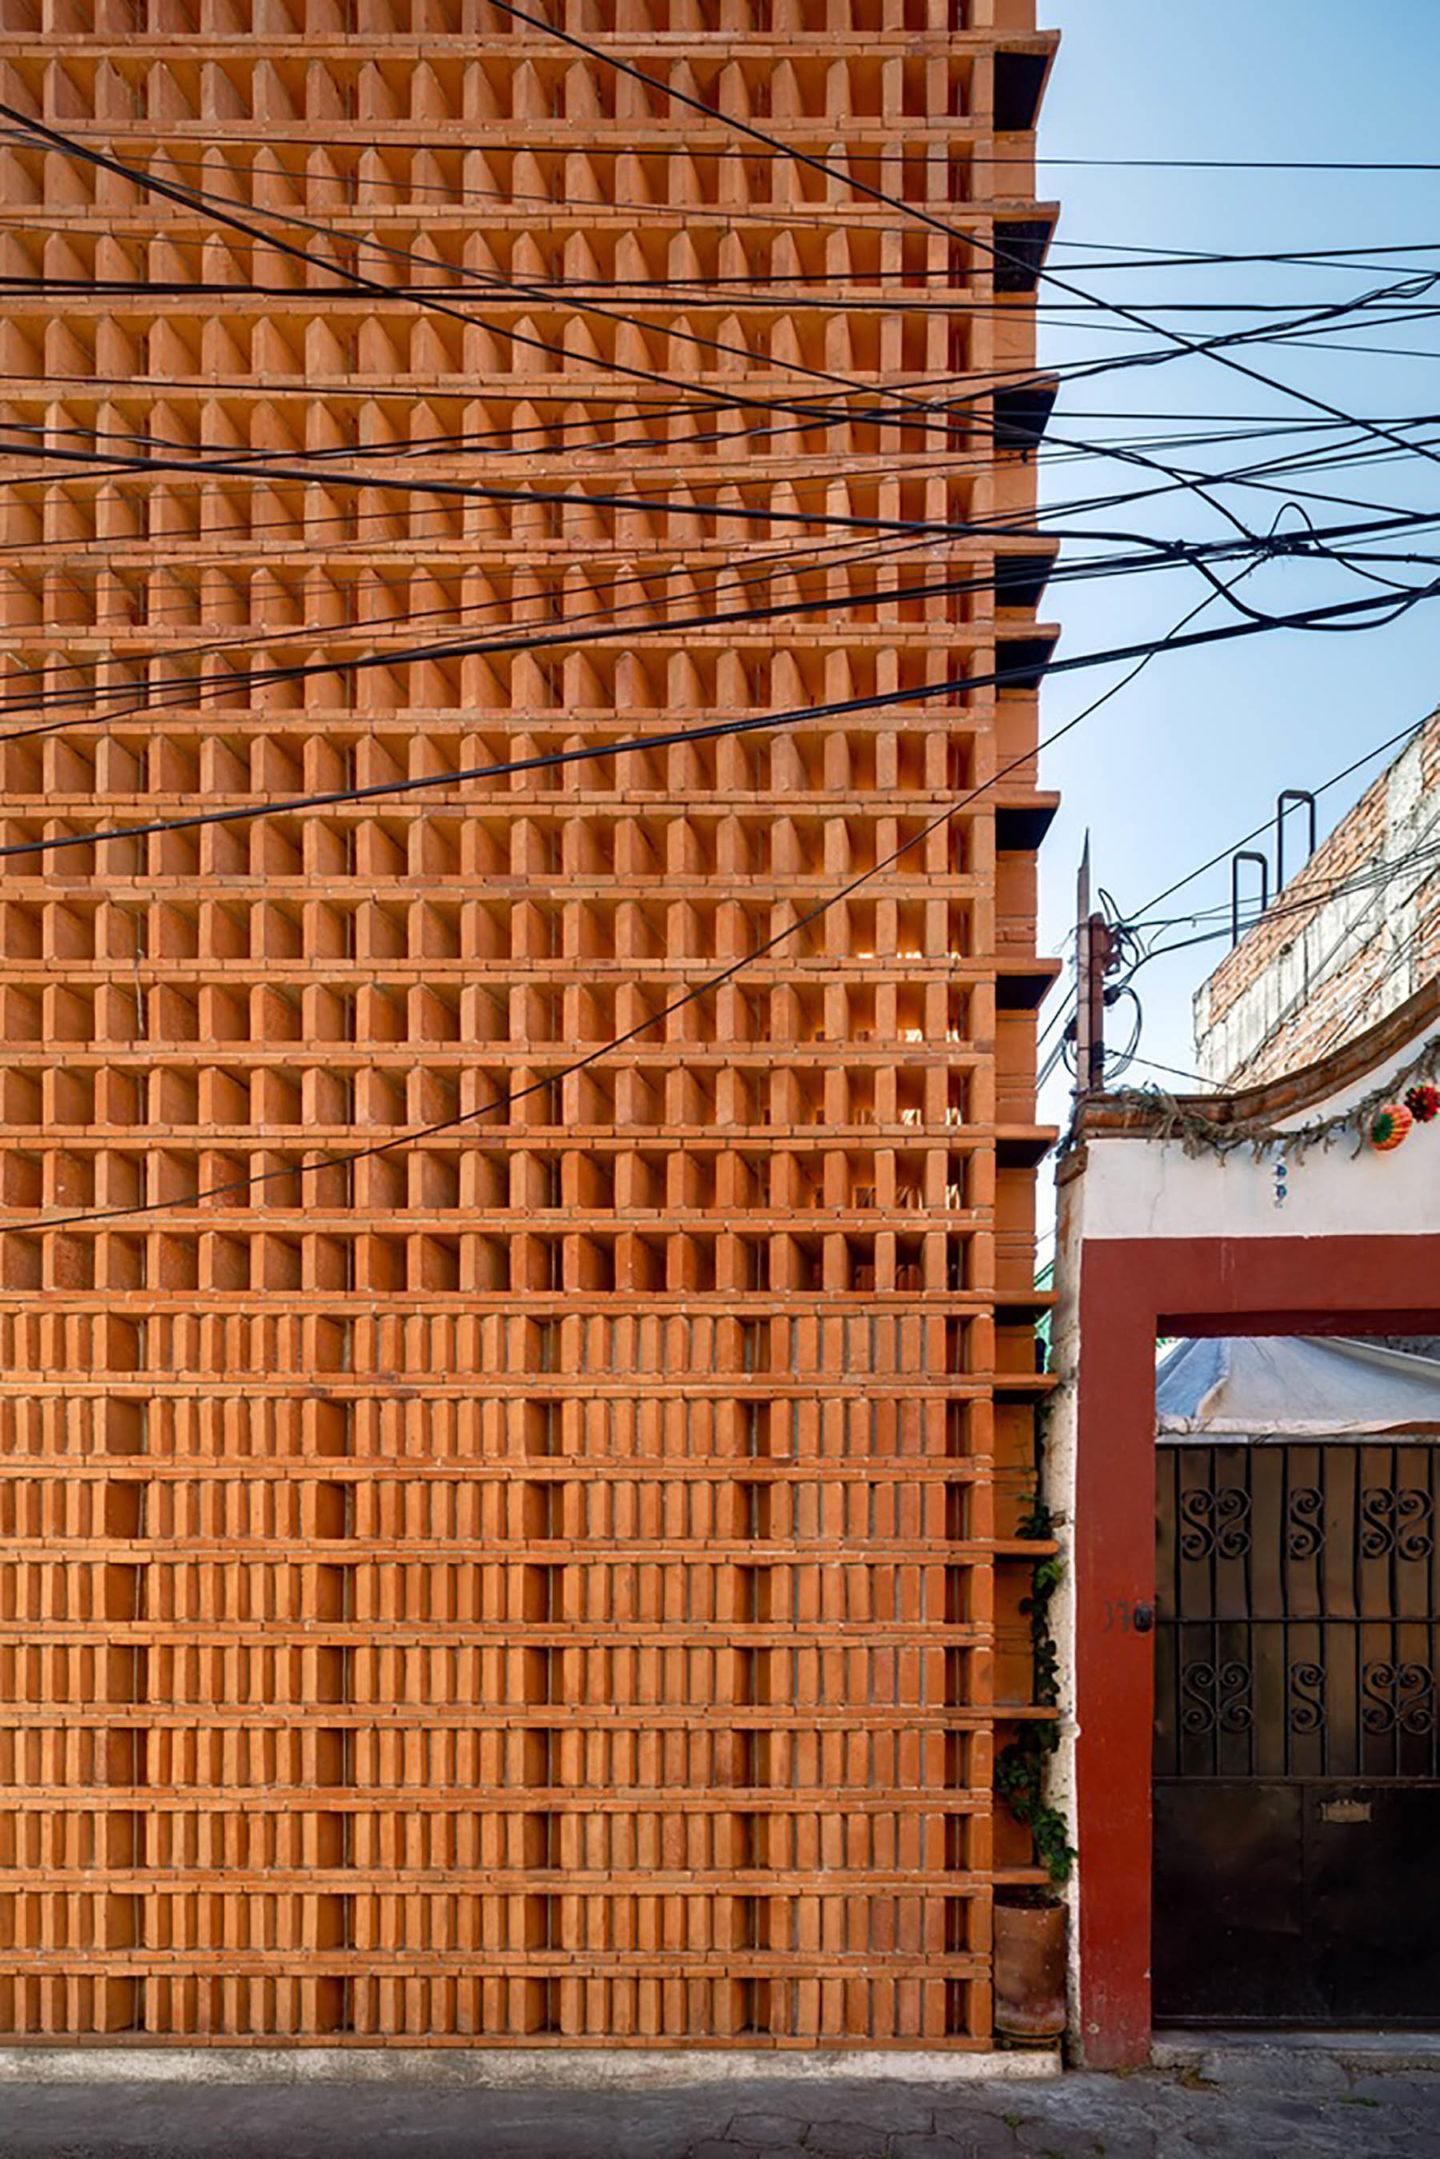 IGNANT-Architecture-Taller-De-Arquitectura-Mauricio-Rocha-Gabriela-Carrillo-Iturbide-Studio-5